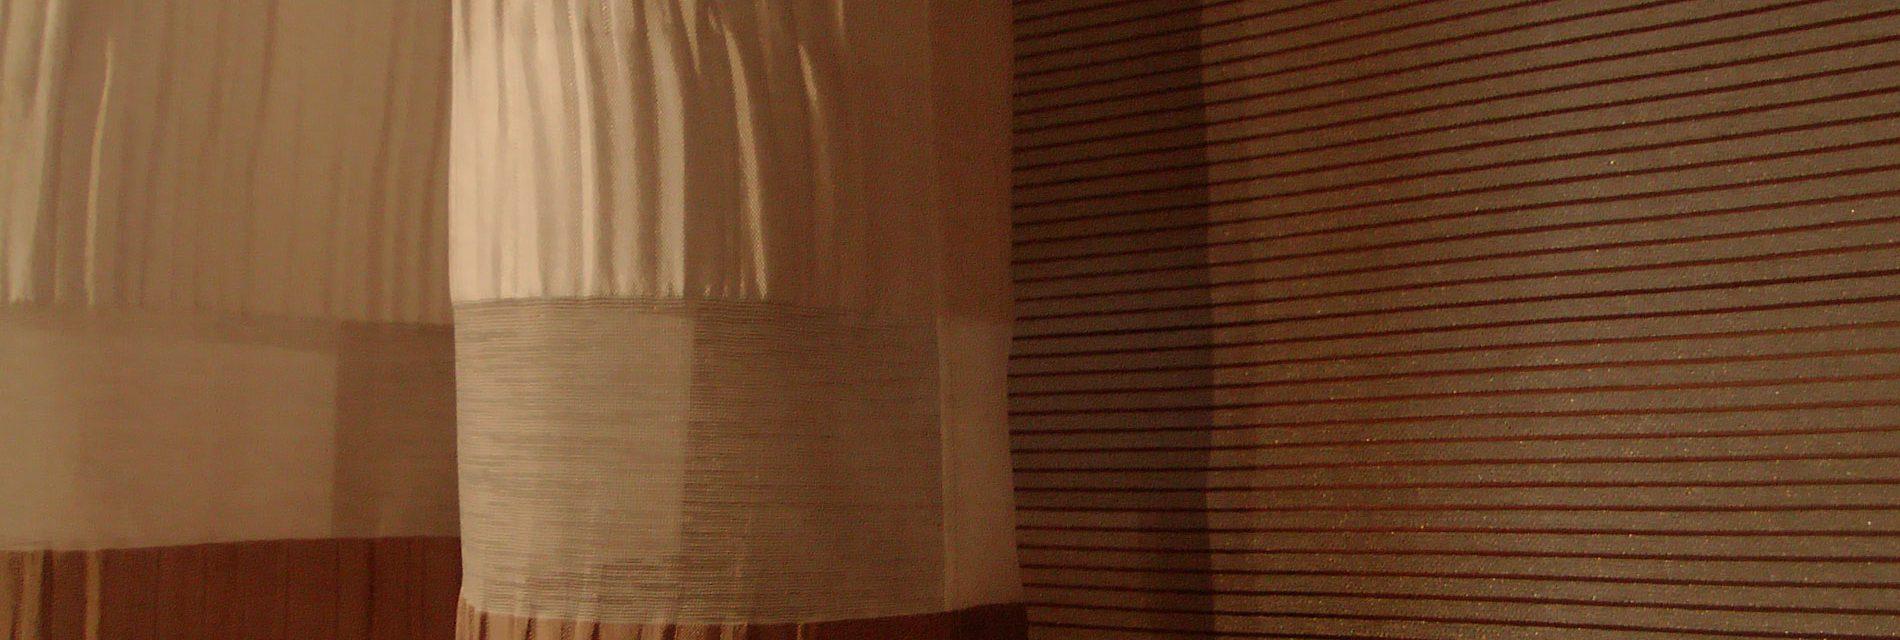 gardinen breuss aus elmshorn gardinendekorationen. Black Bedroom Furniture Sets. Home Design Ideas